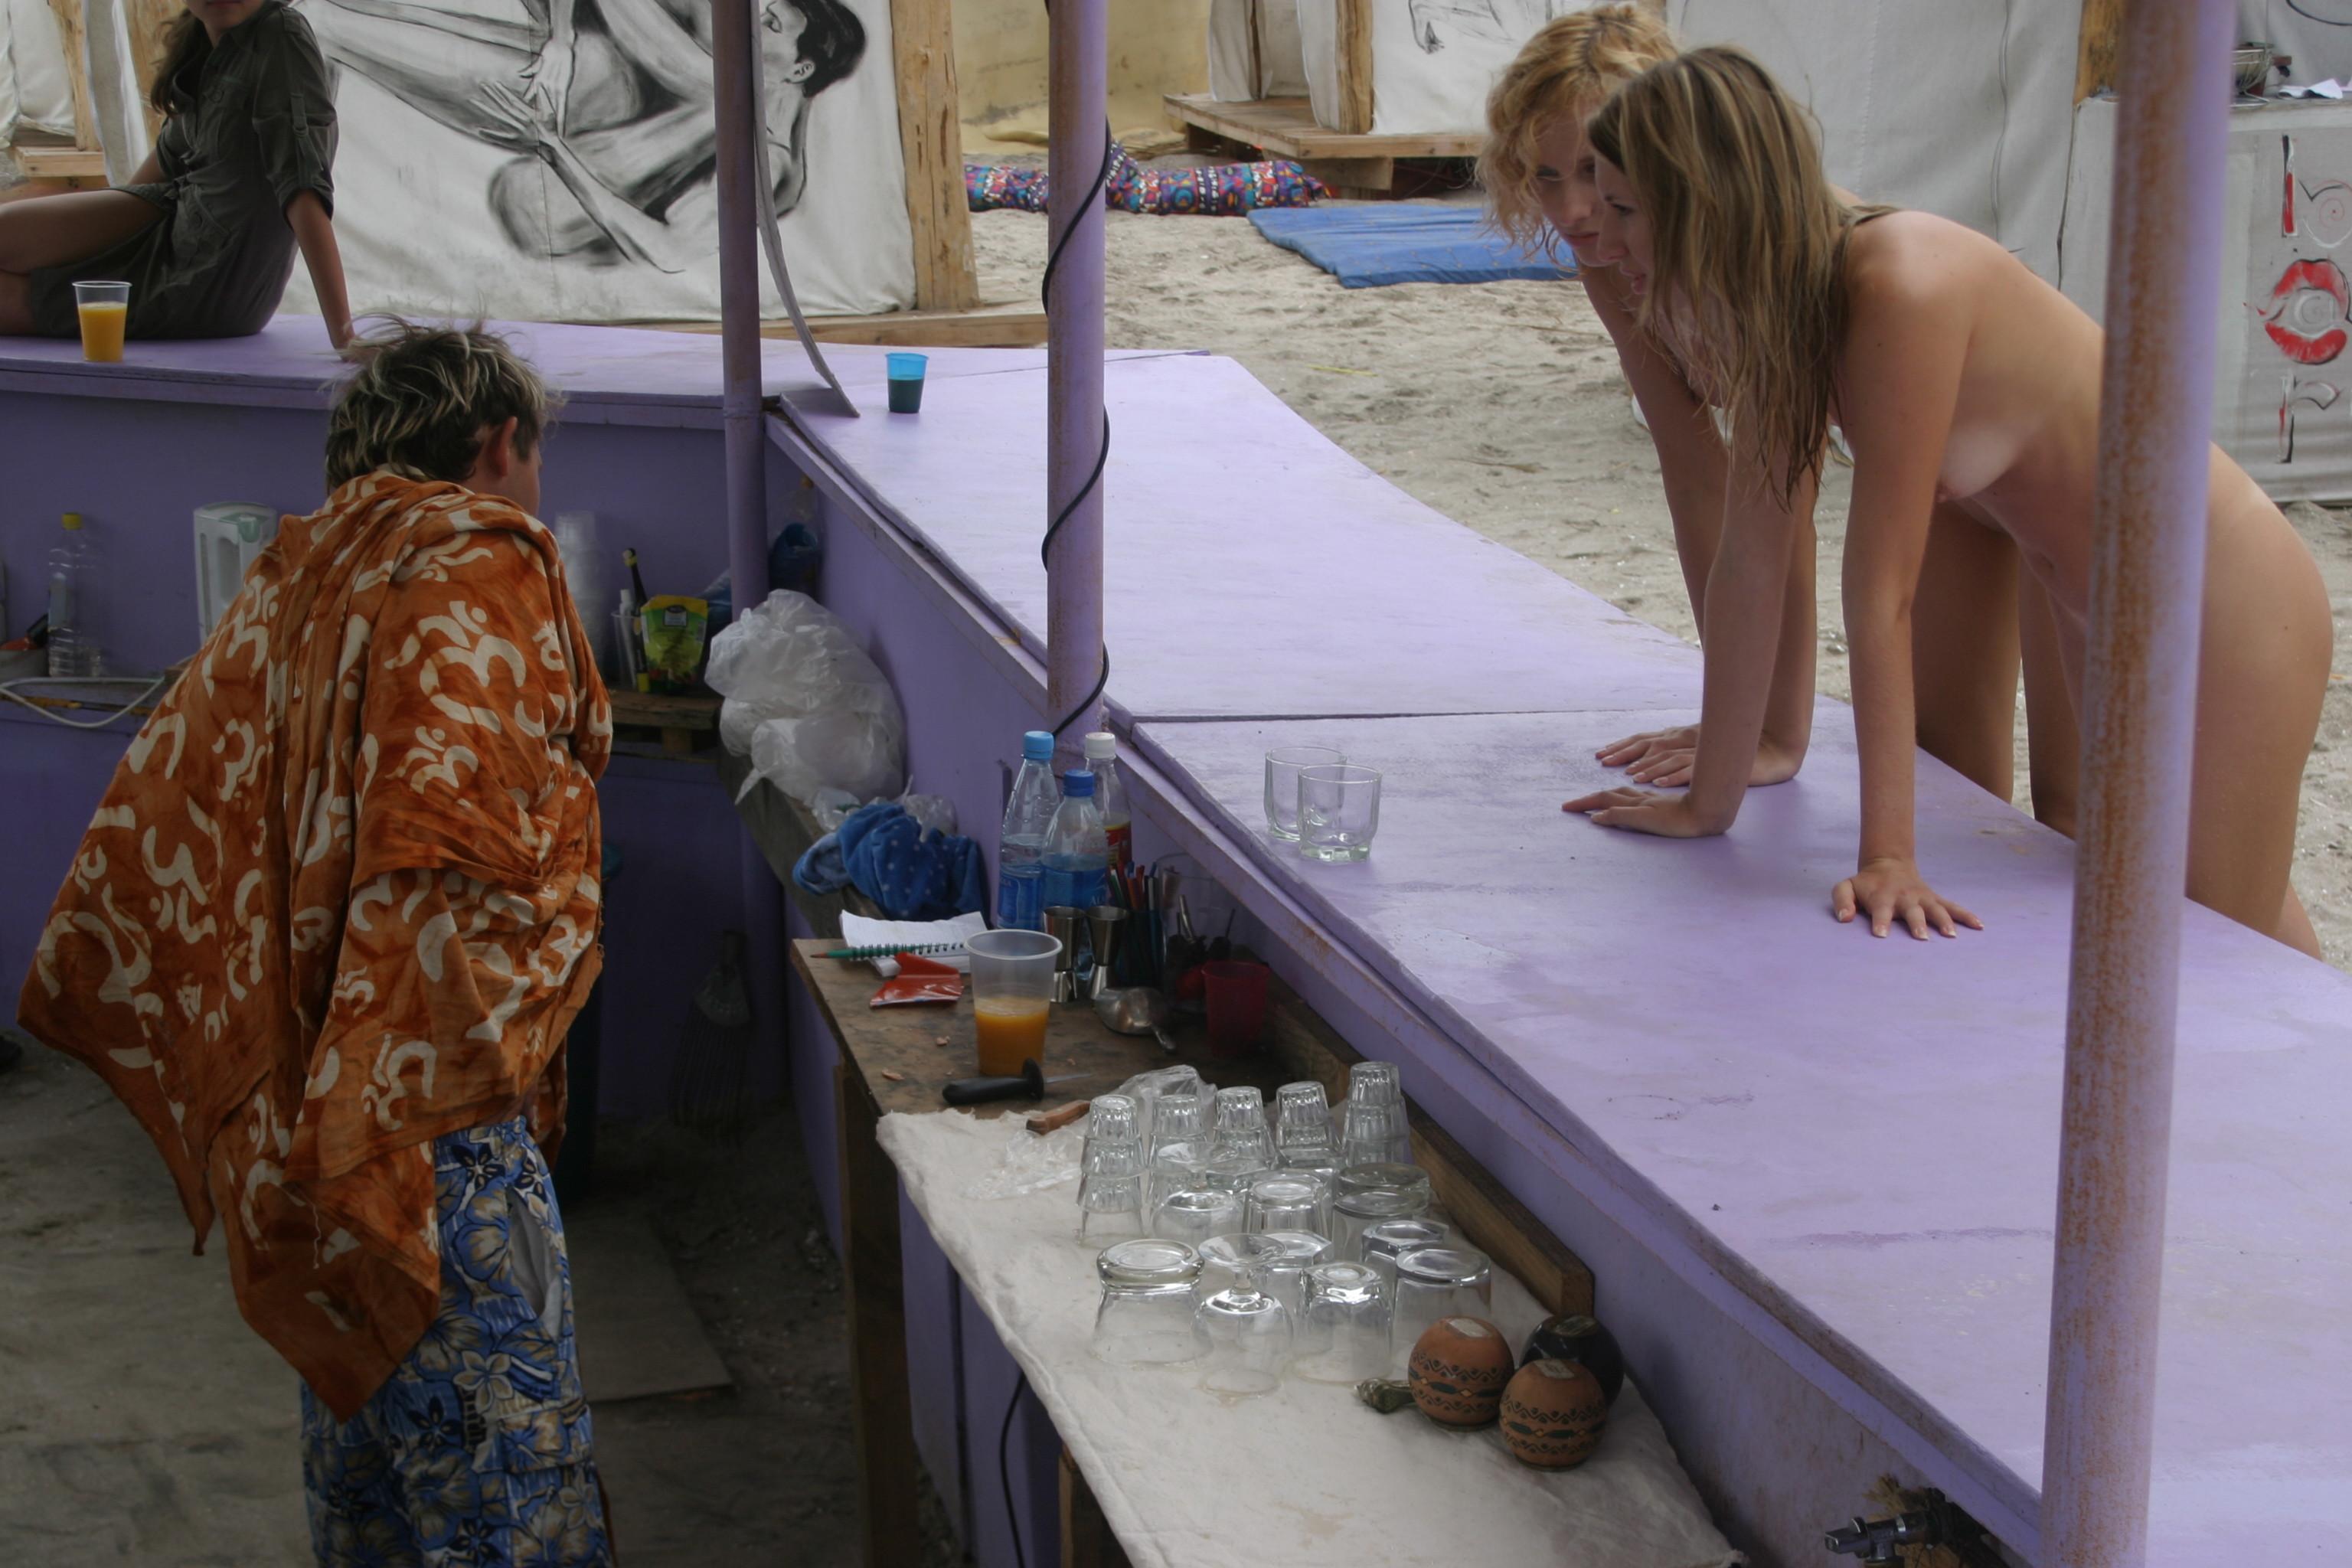 vika-y-lena-l-beach-nude-in-public-metart-14